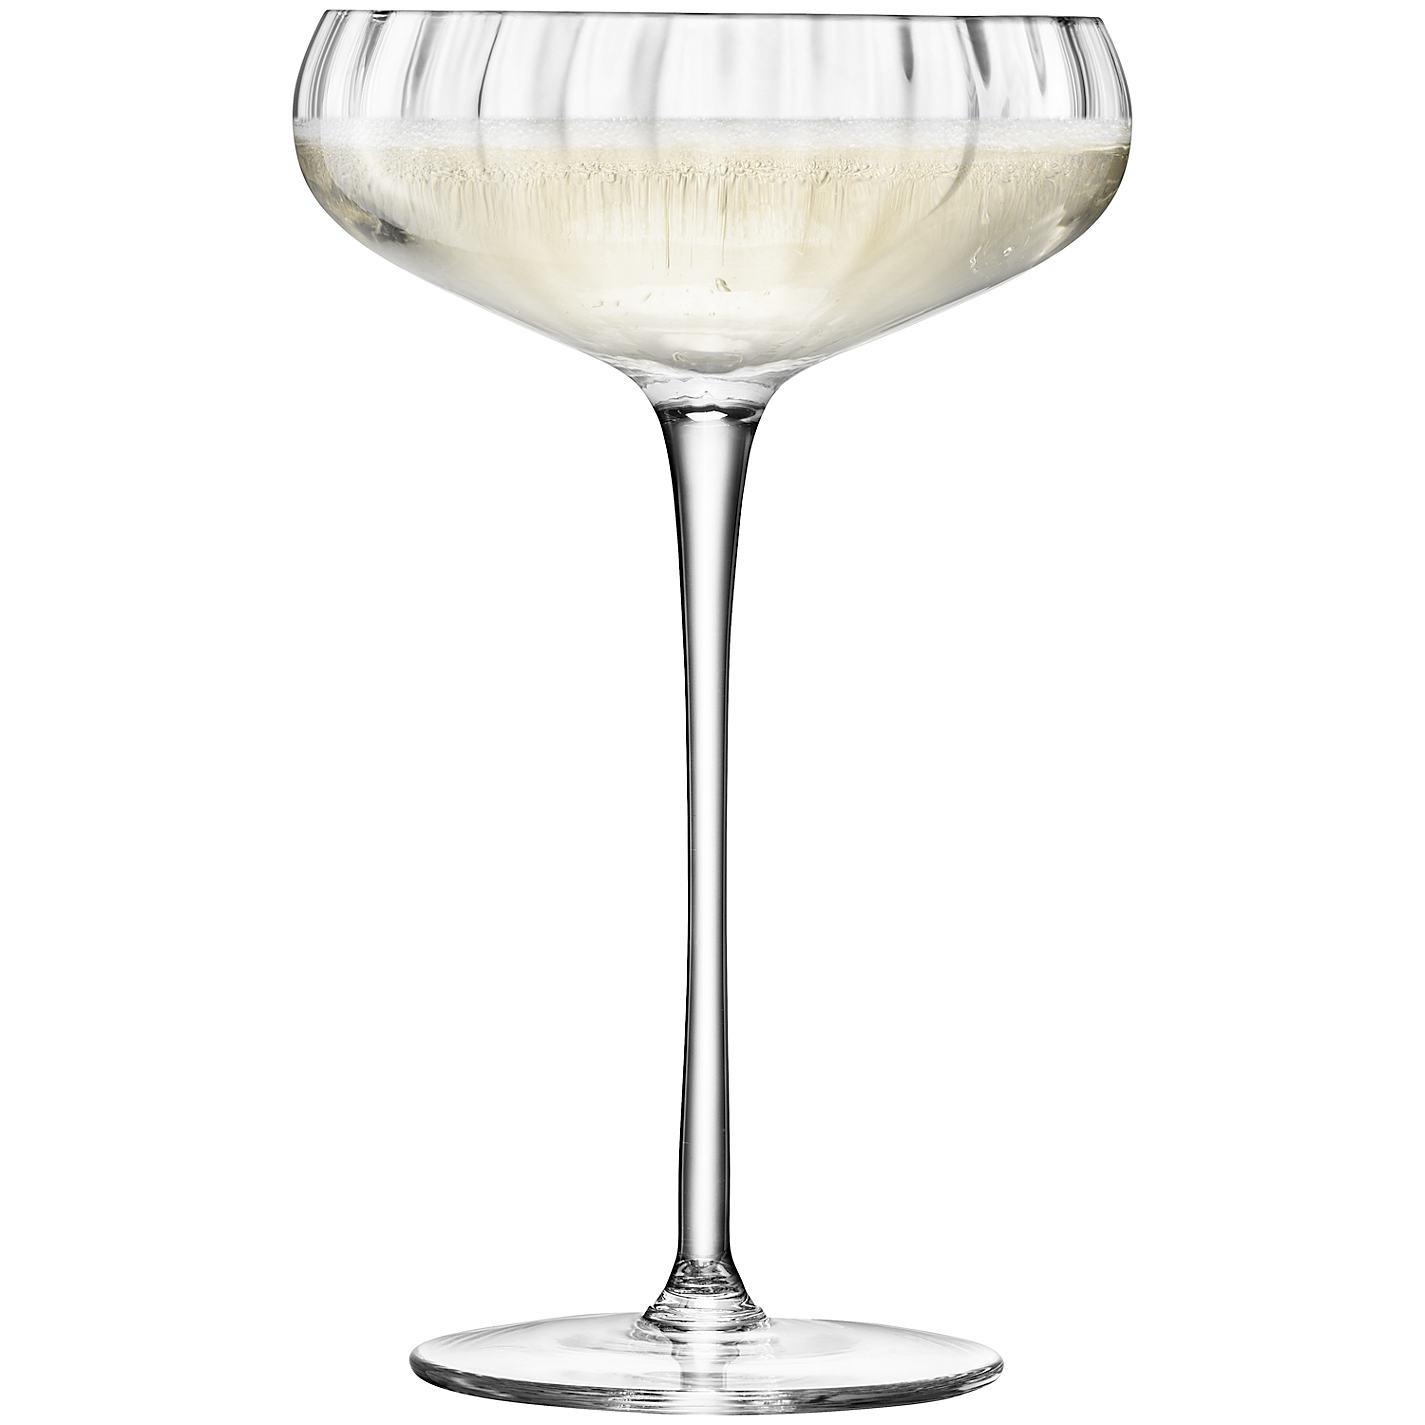 vase martini ikea nate berkus woven wrapped vase with vase martini ikea ikeaus godis glasses. Black Bedroom Furniture Sets. Home Design Ideas